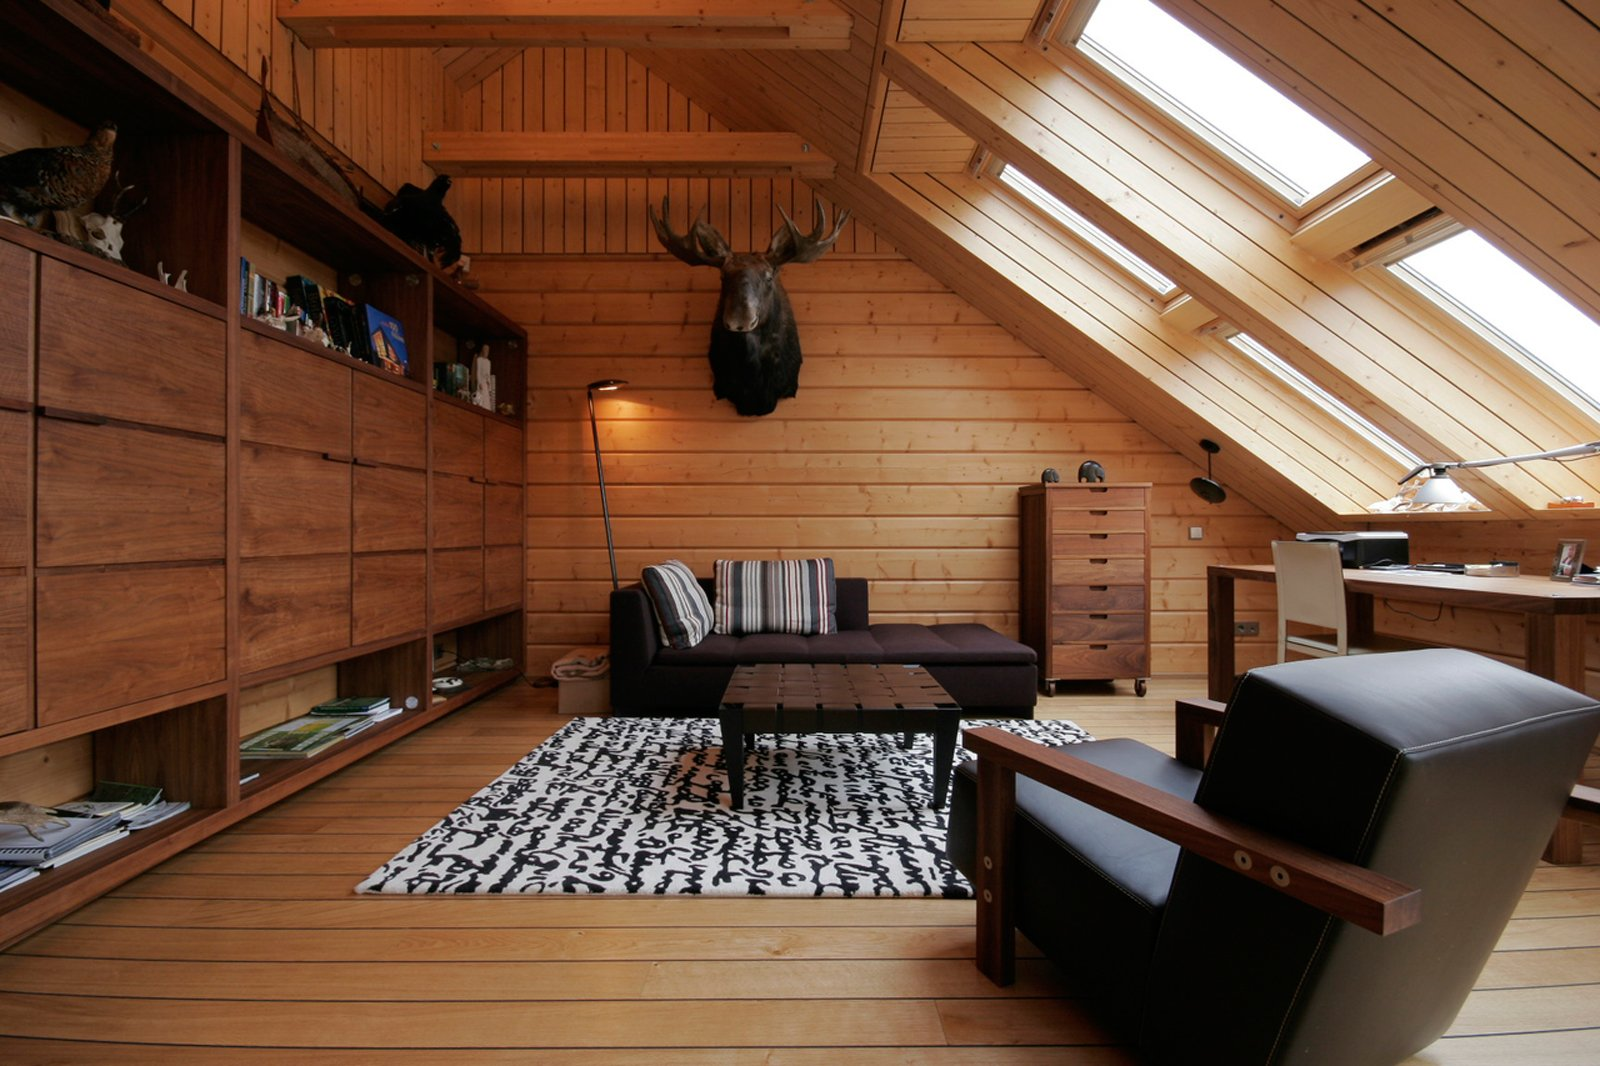 Mansarda effetto legno cose di casa for Foto di mansarde arredate